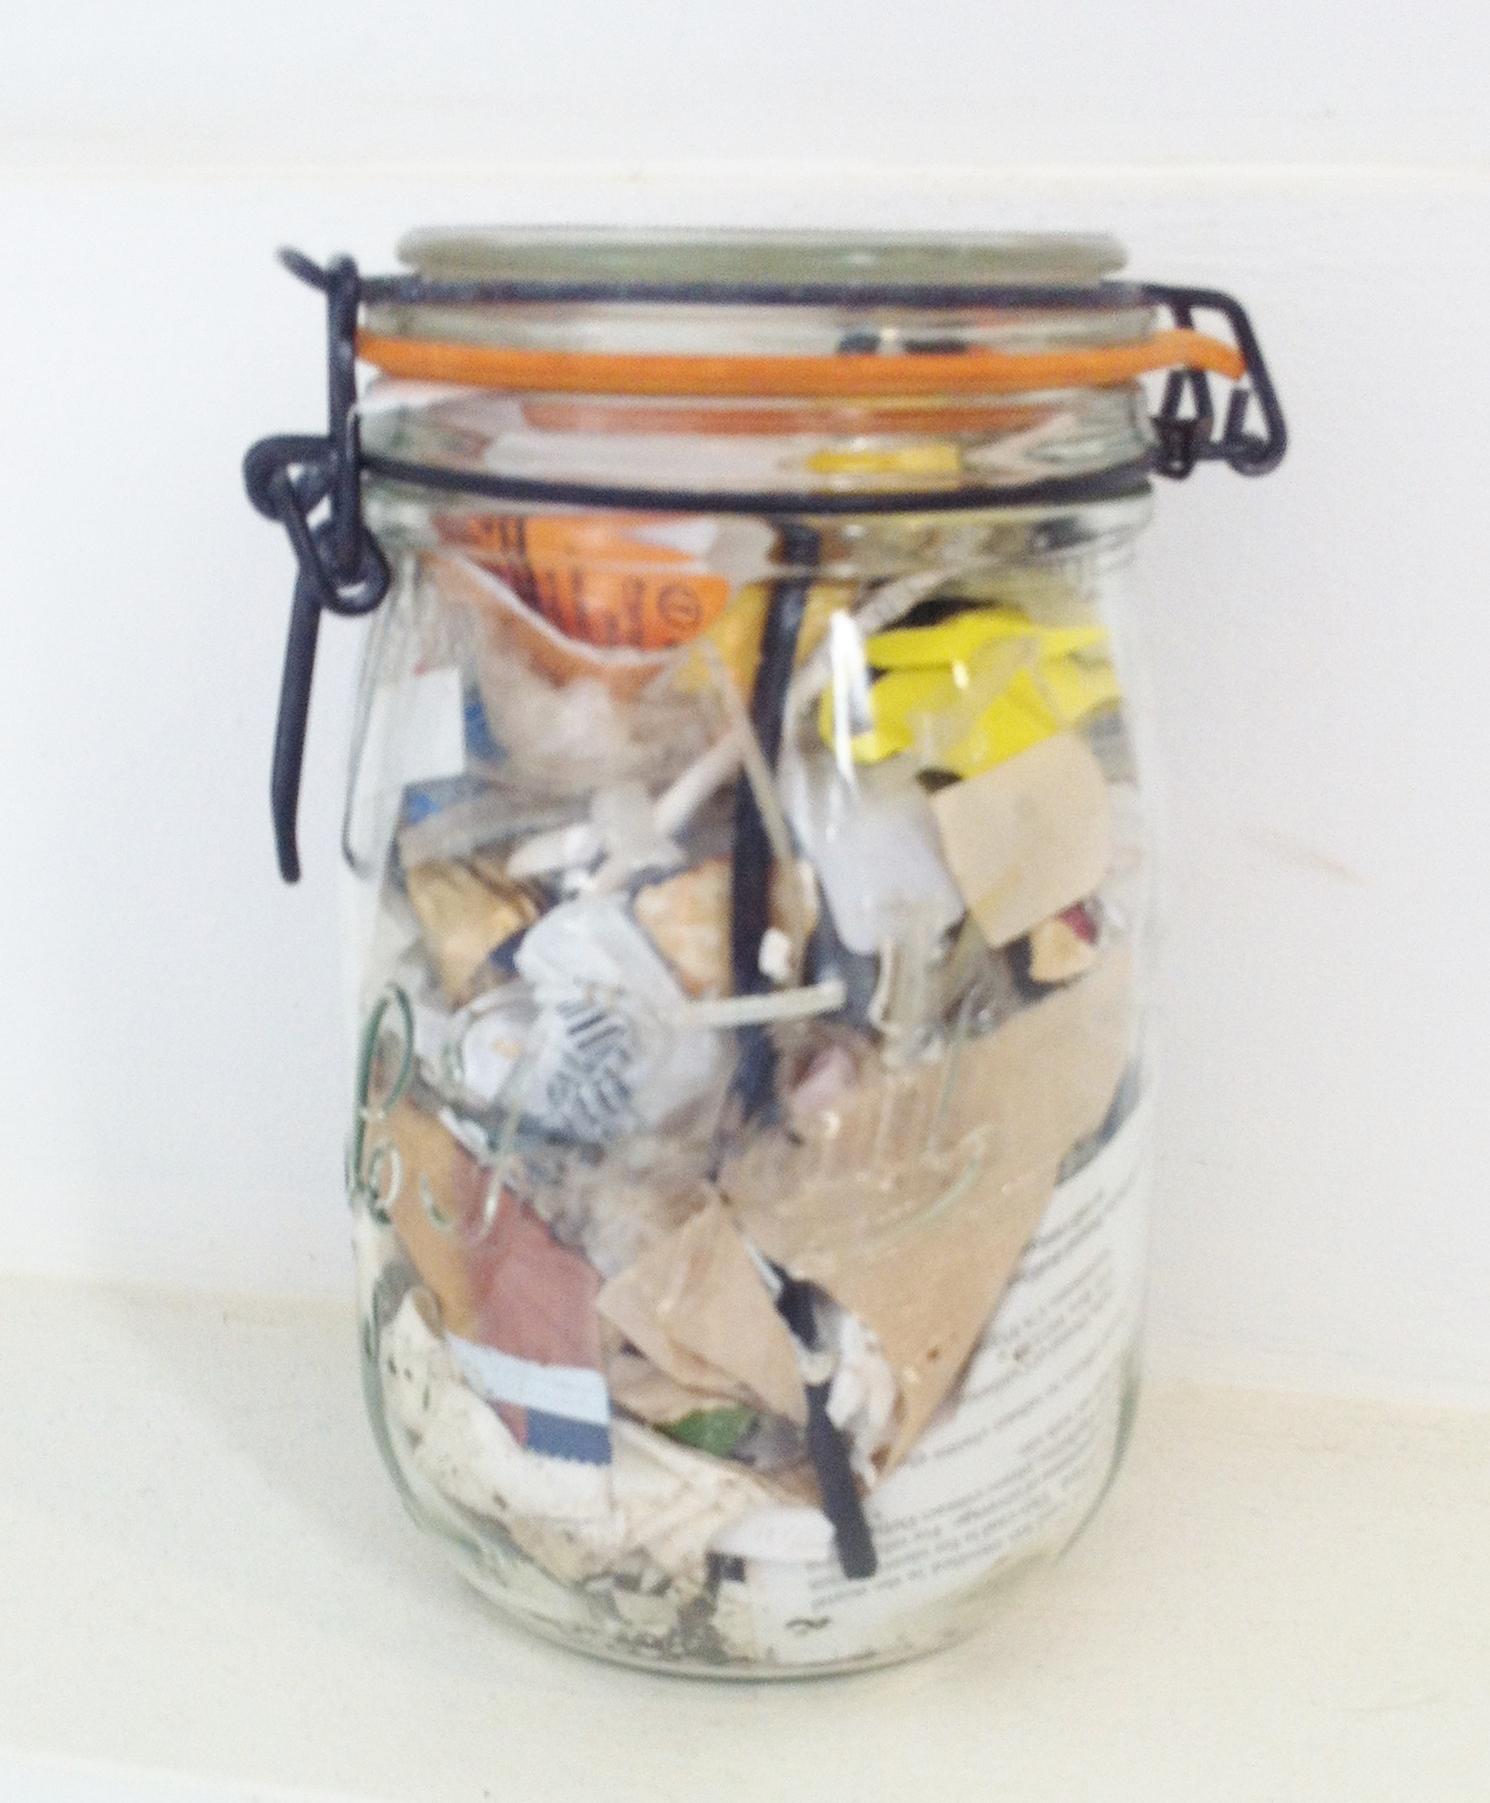 ... zero waste home, eat zero waste meals, and take zero waste vacations